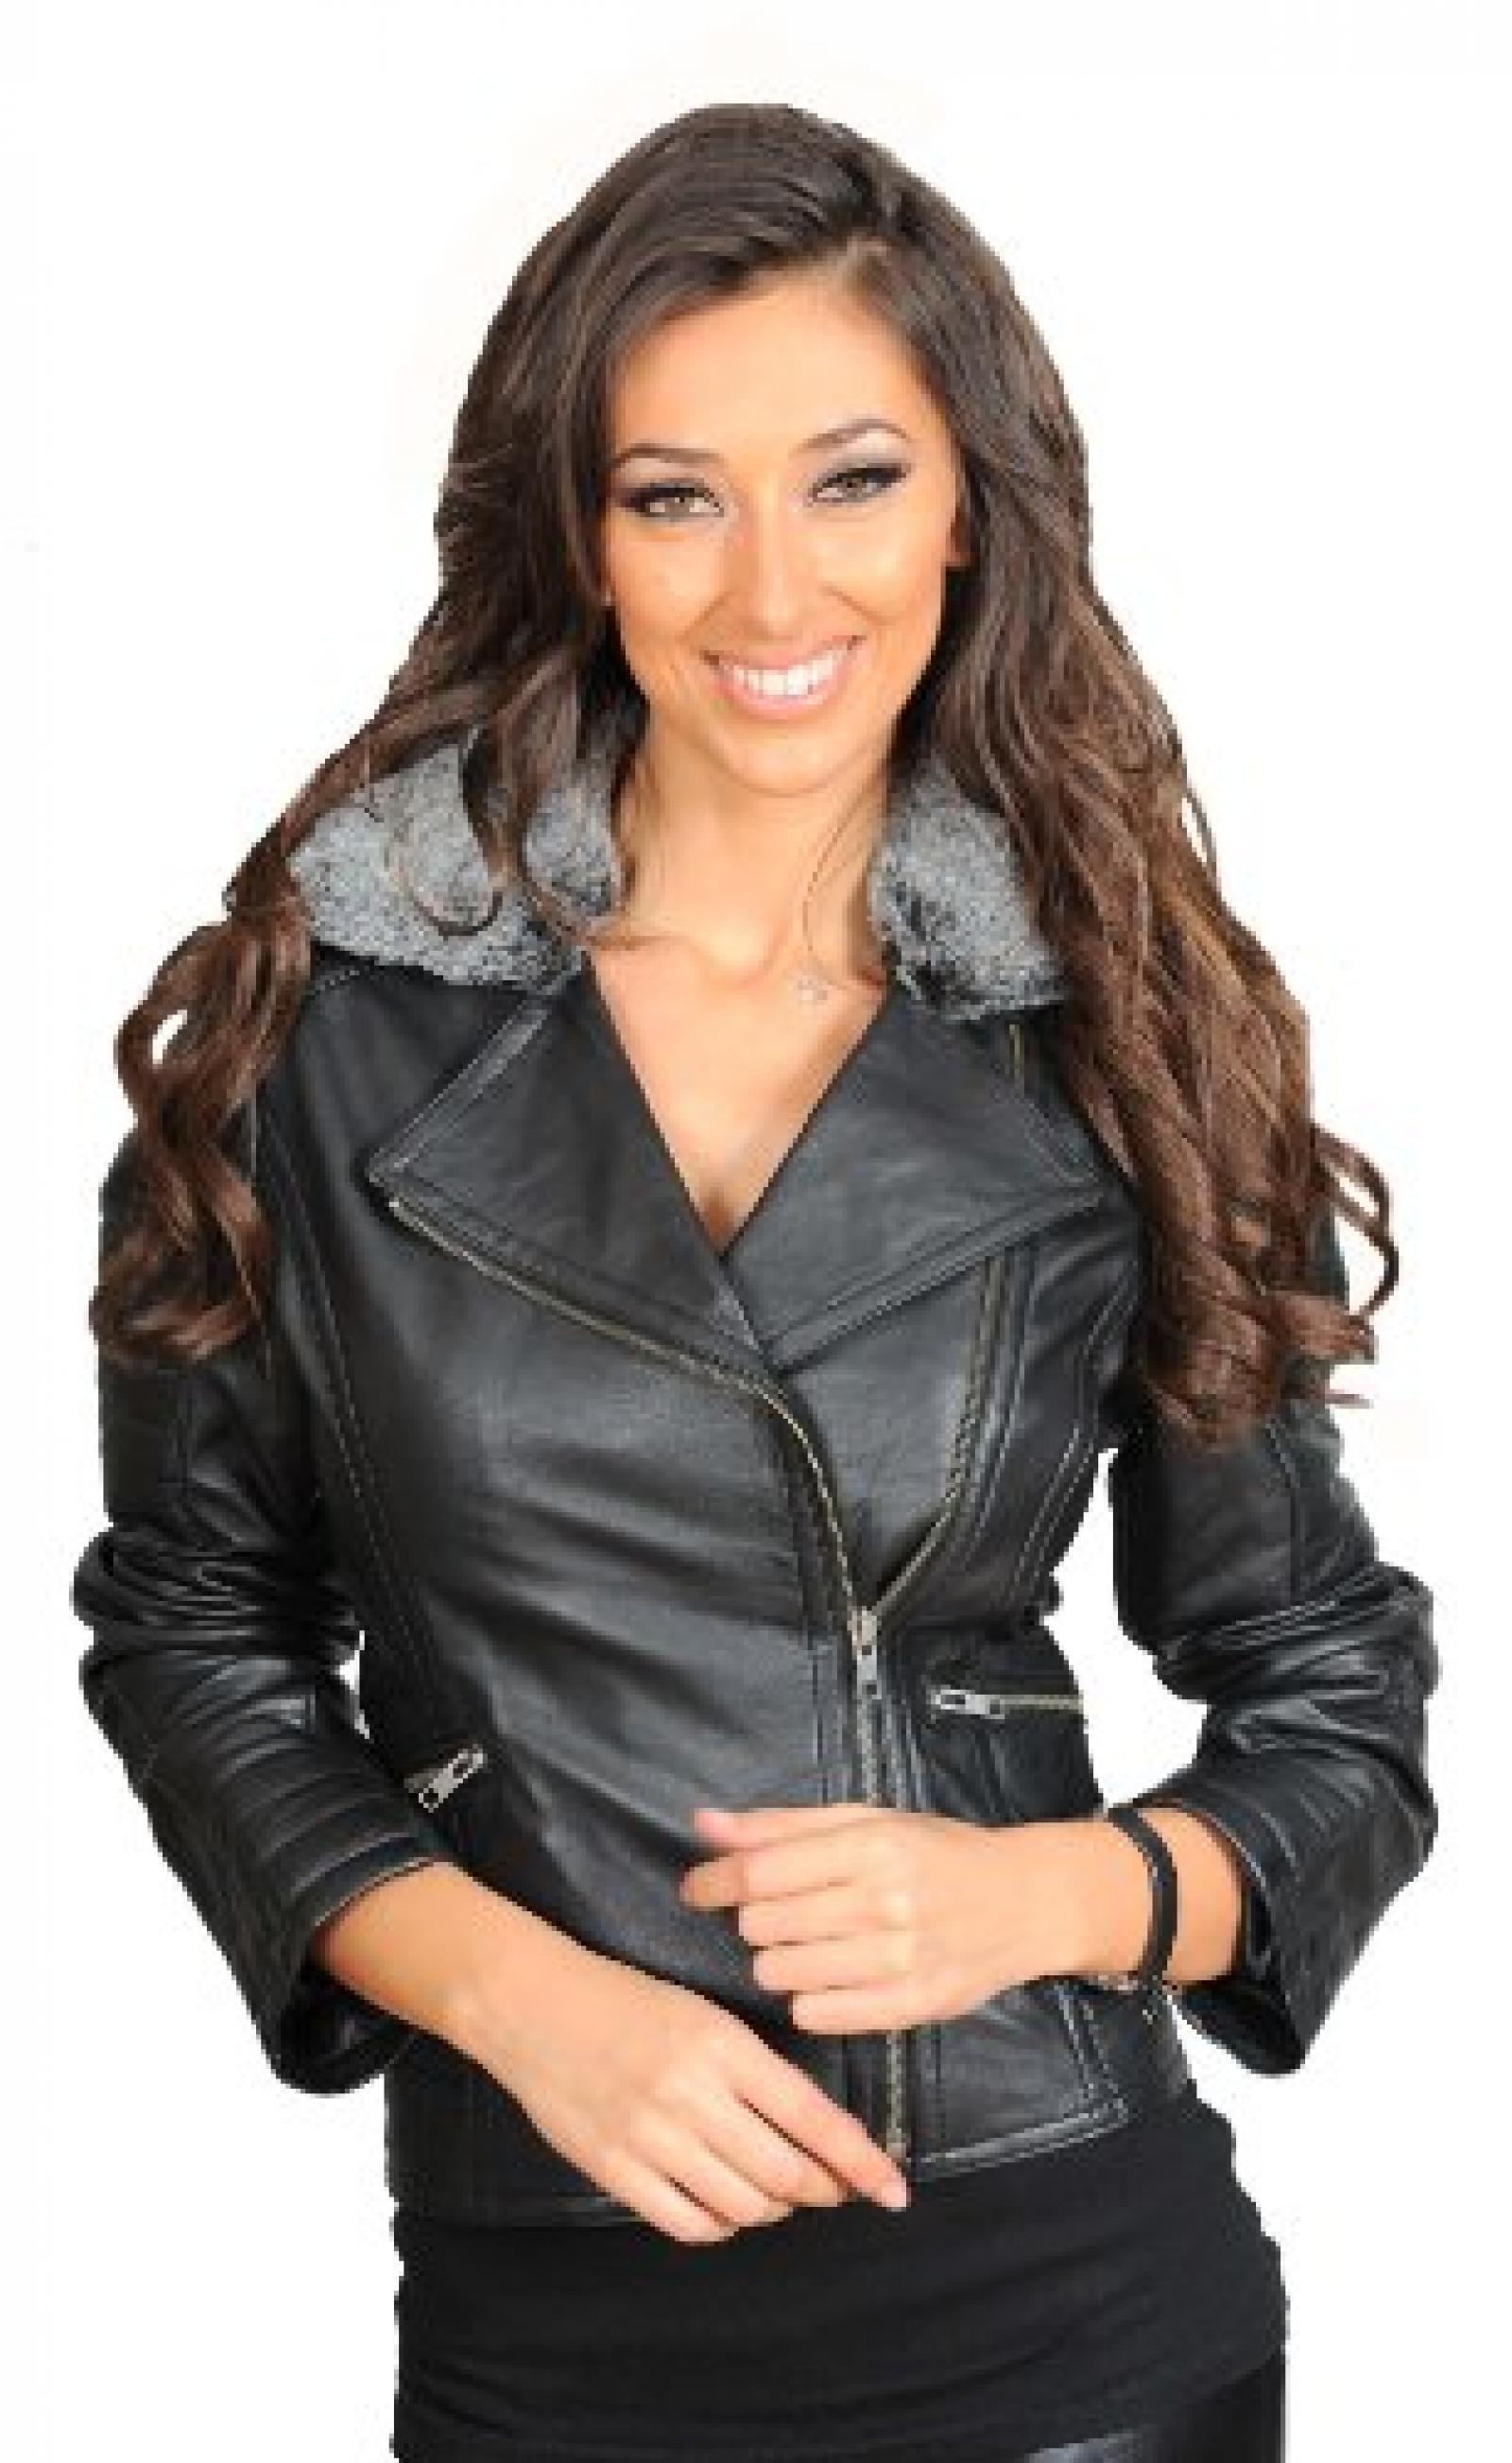 Damen Biker Stil ausgestattet Lederjacke Frauen Pelzkragen ausgestattet Garment Gia Schwarz